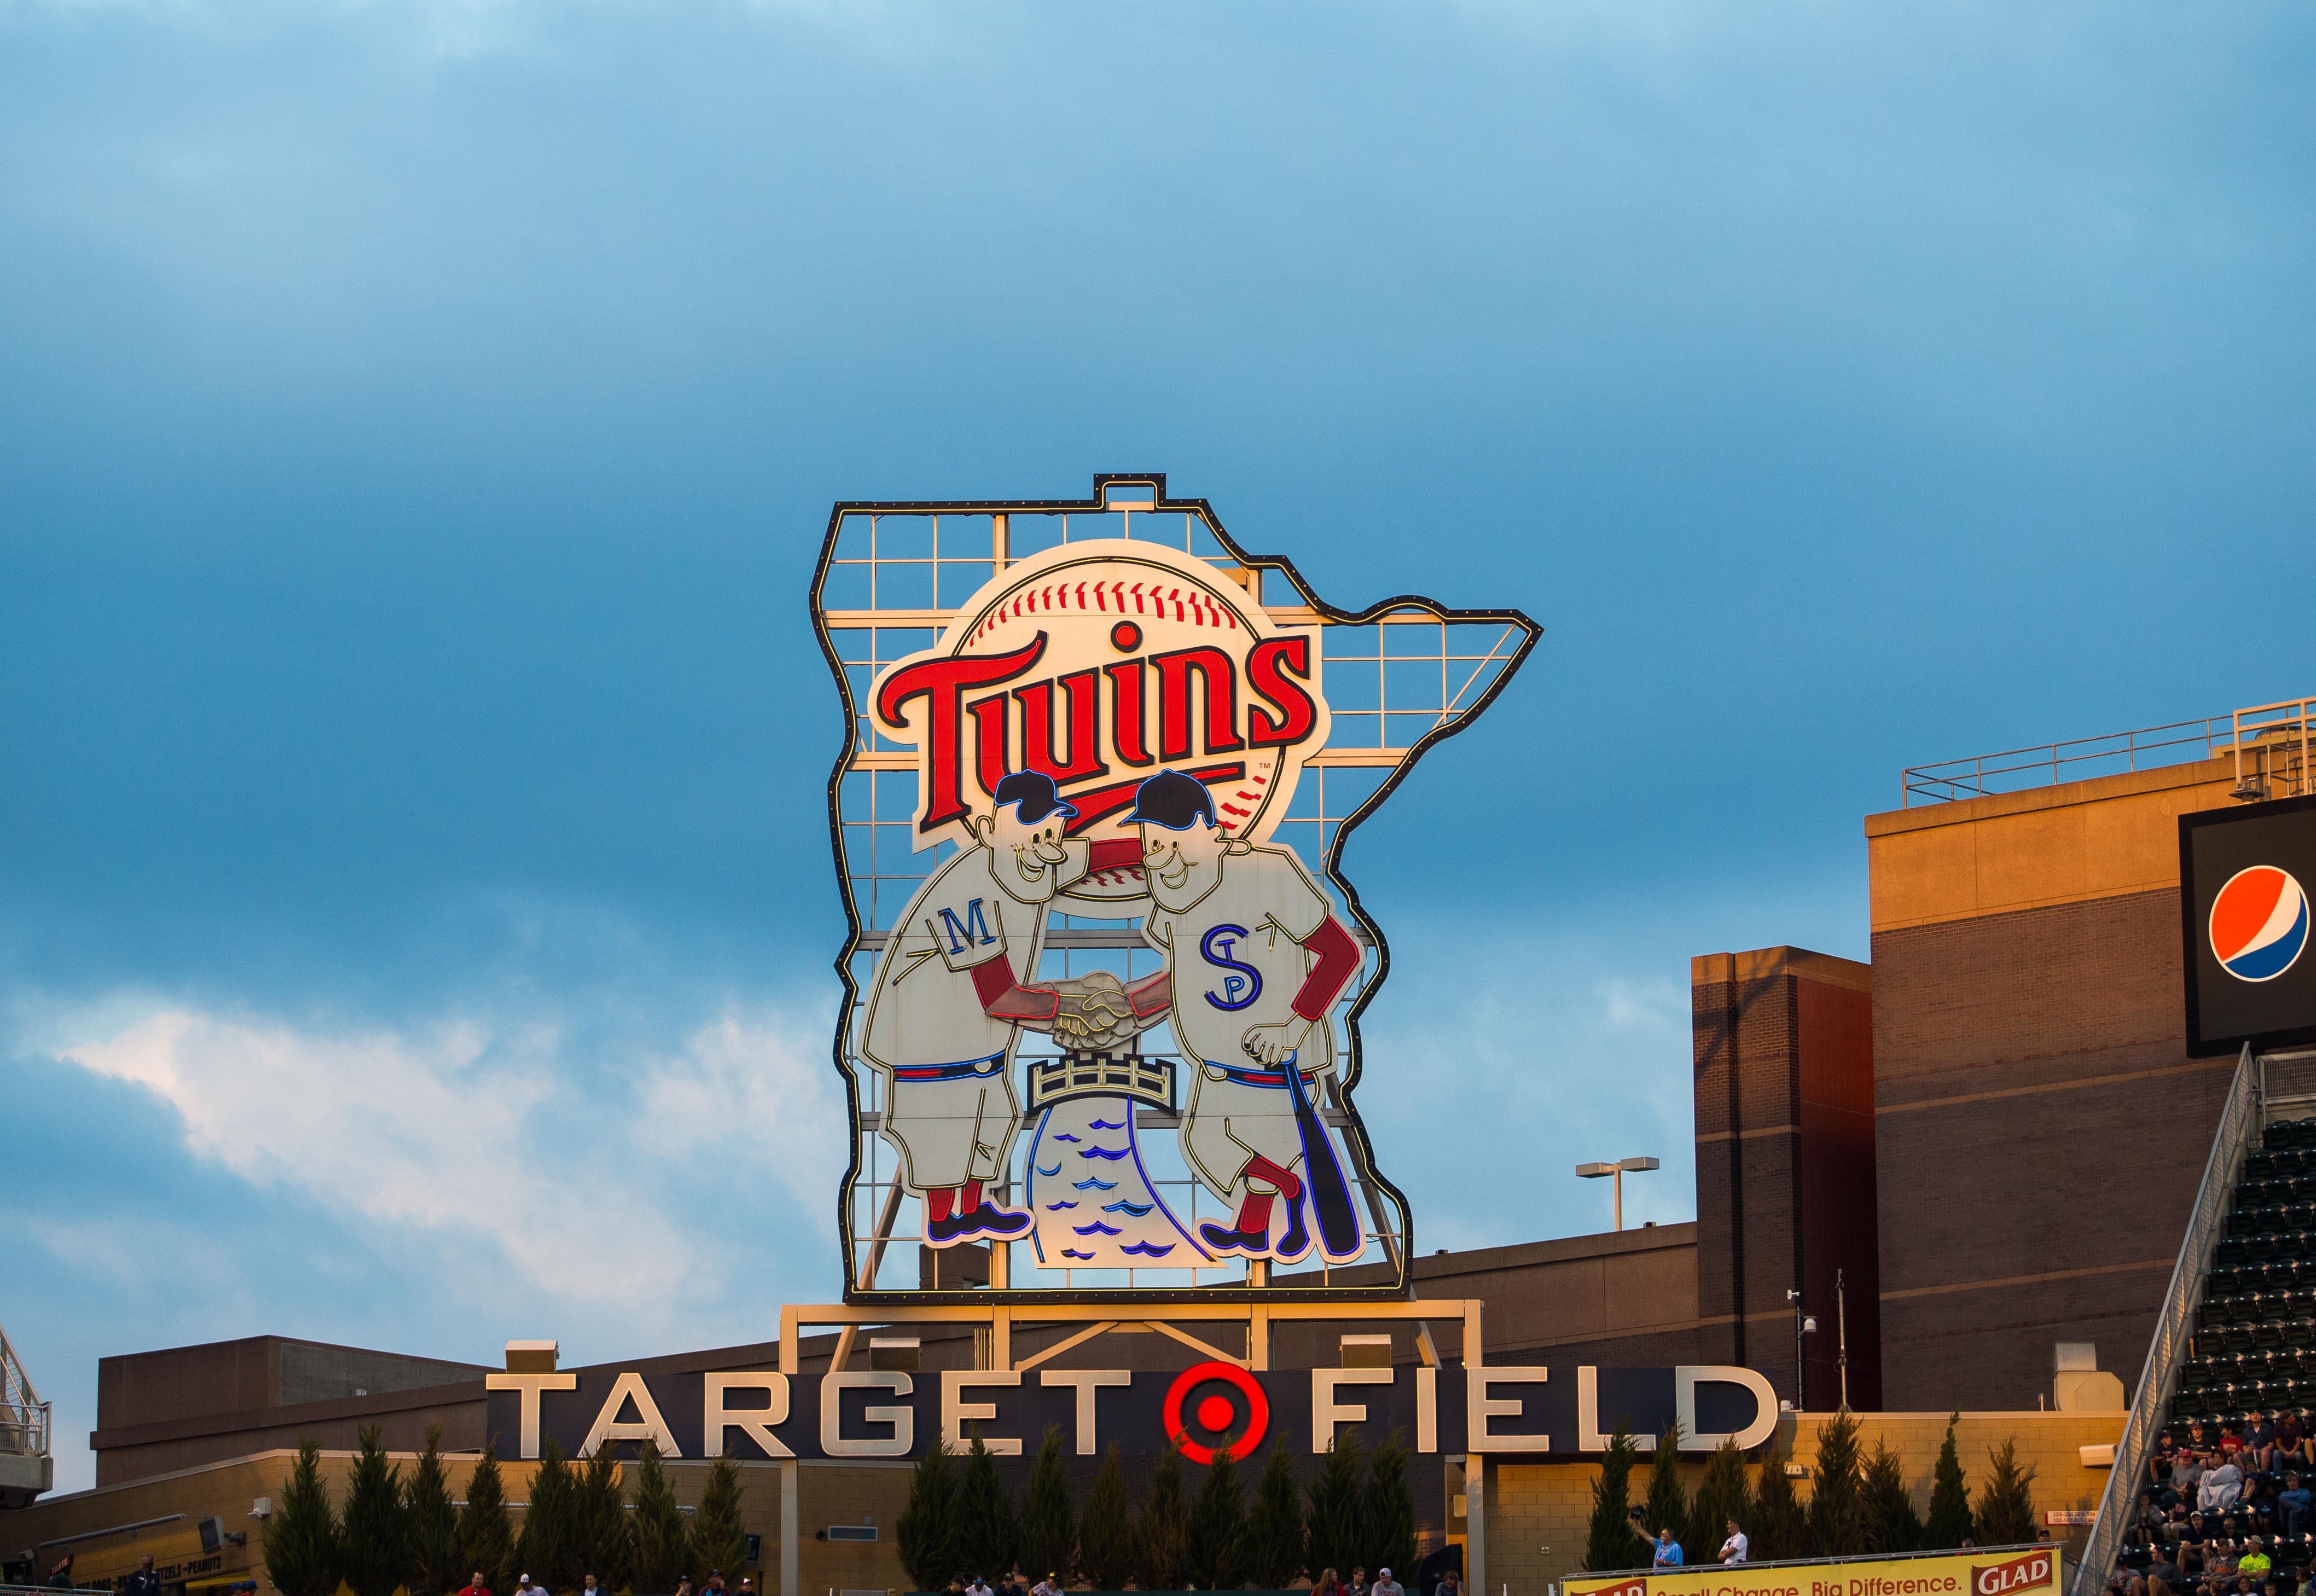 MLB: Baltimore Orioles at Minnesota Twins